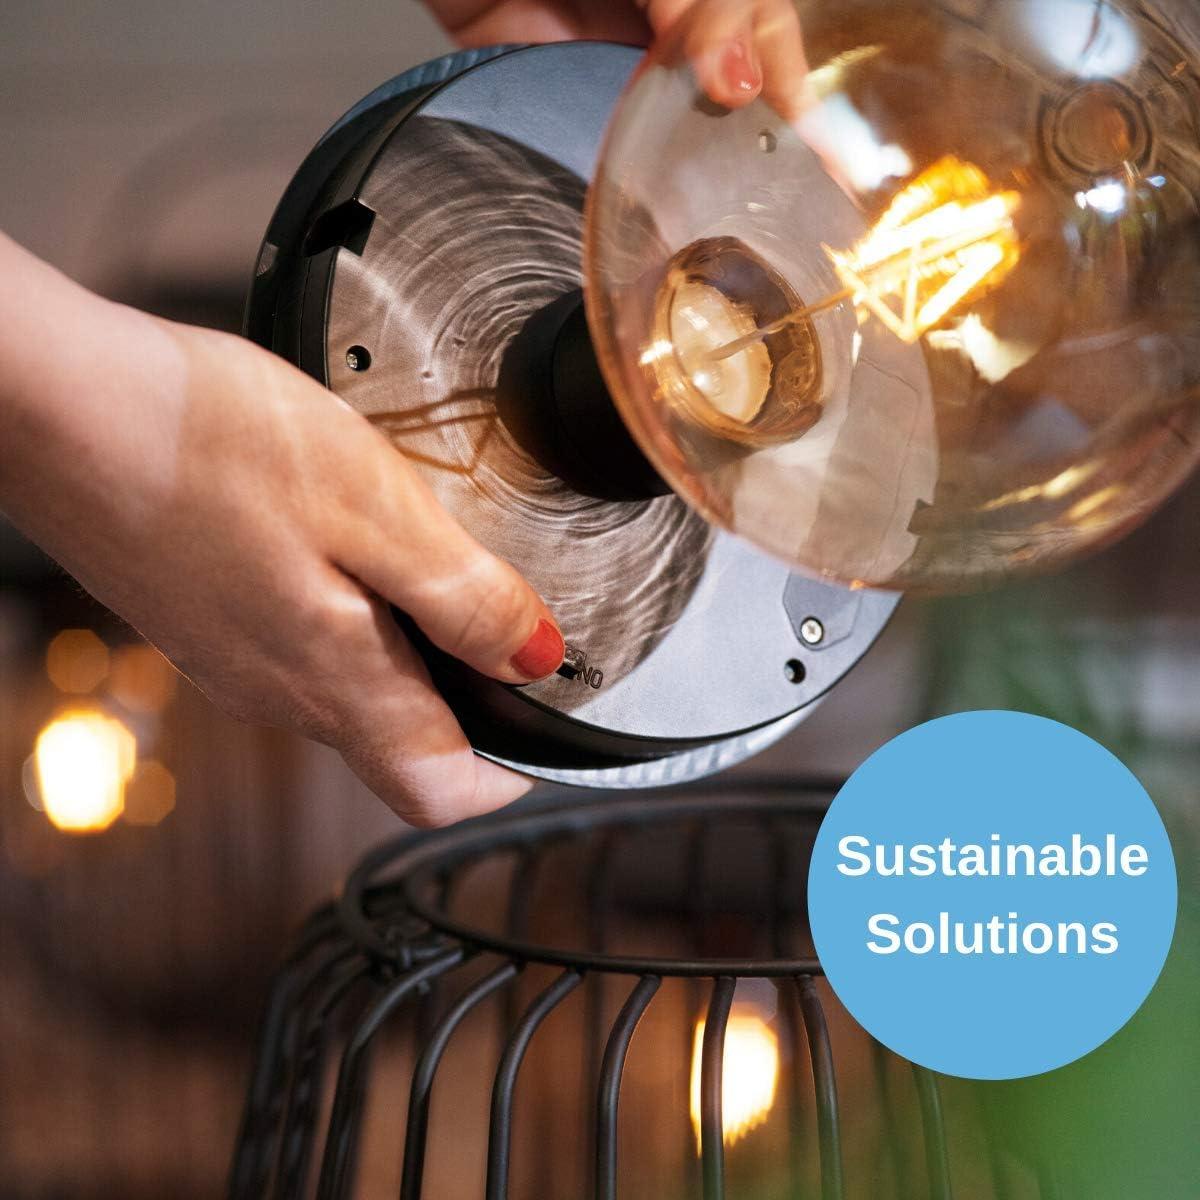 Decorative Garden Patio Table Light CLAS Ohlson /® Solar Light Ceramic Lantern 10 cm Cut Out Light Up Design